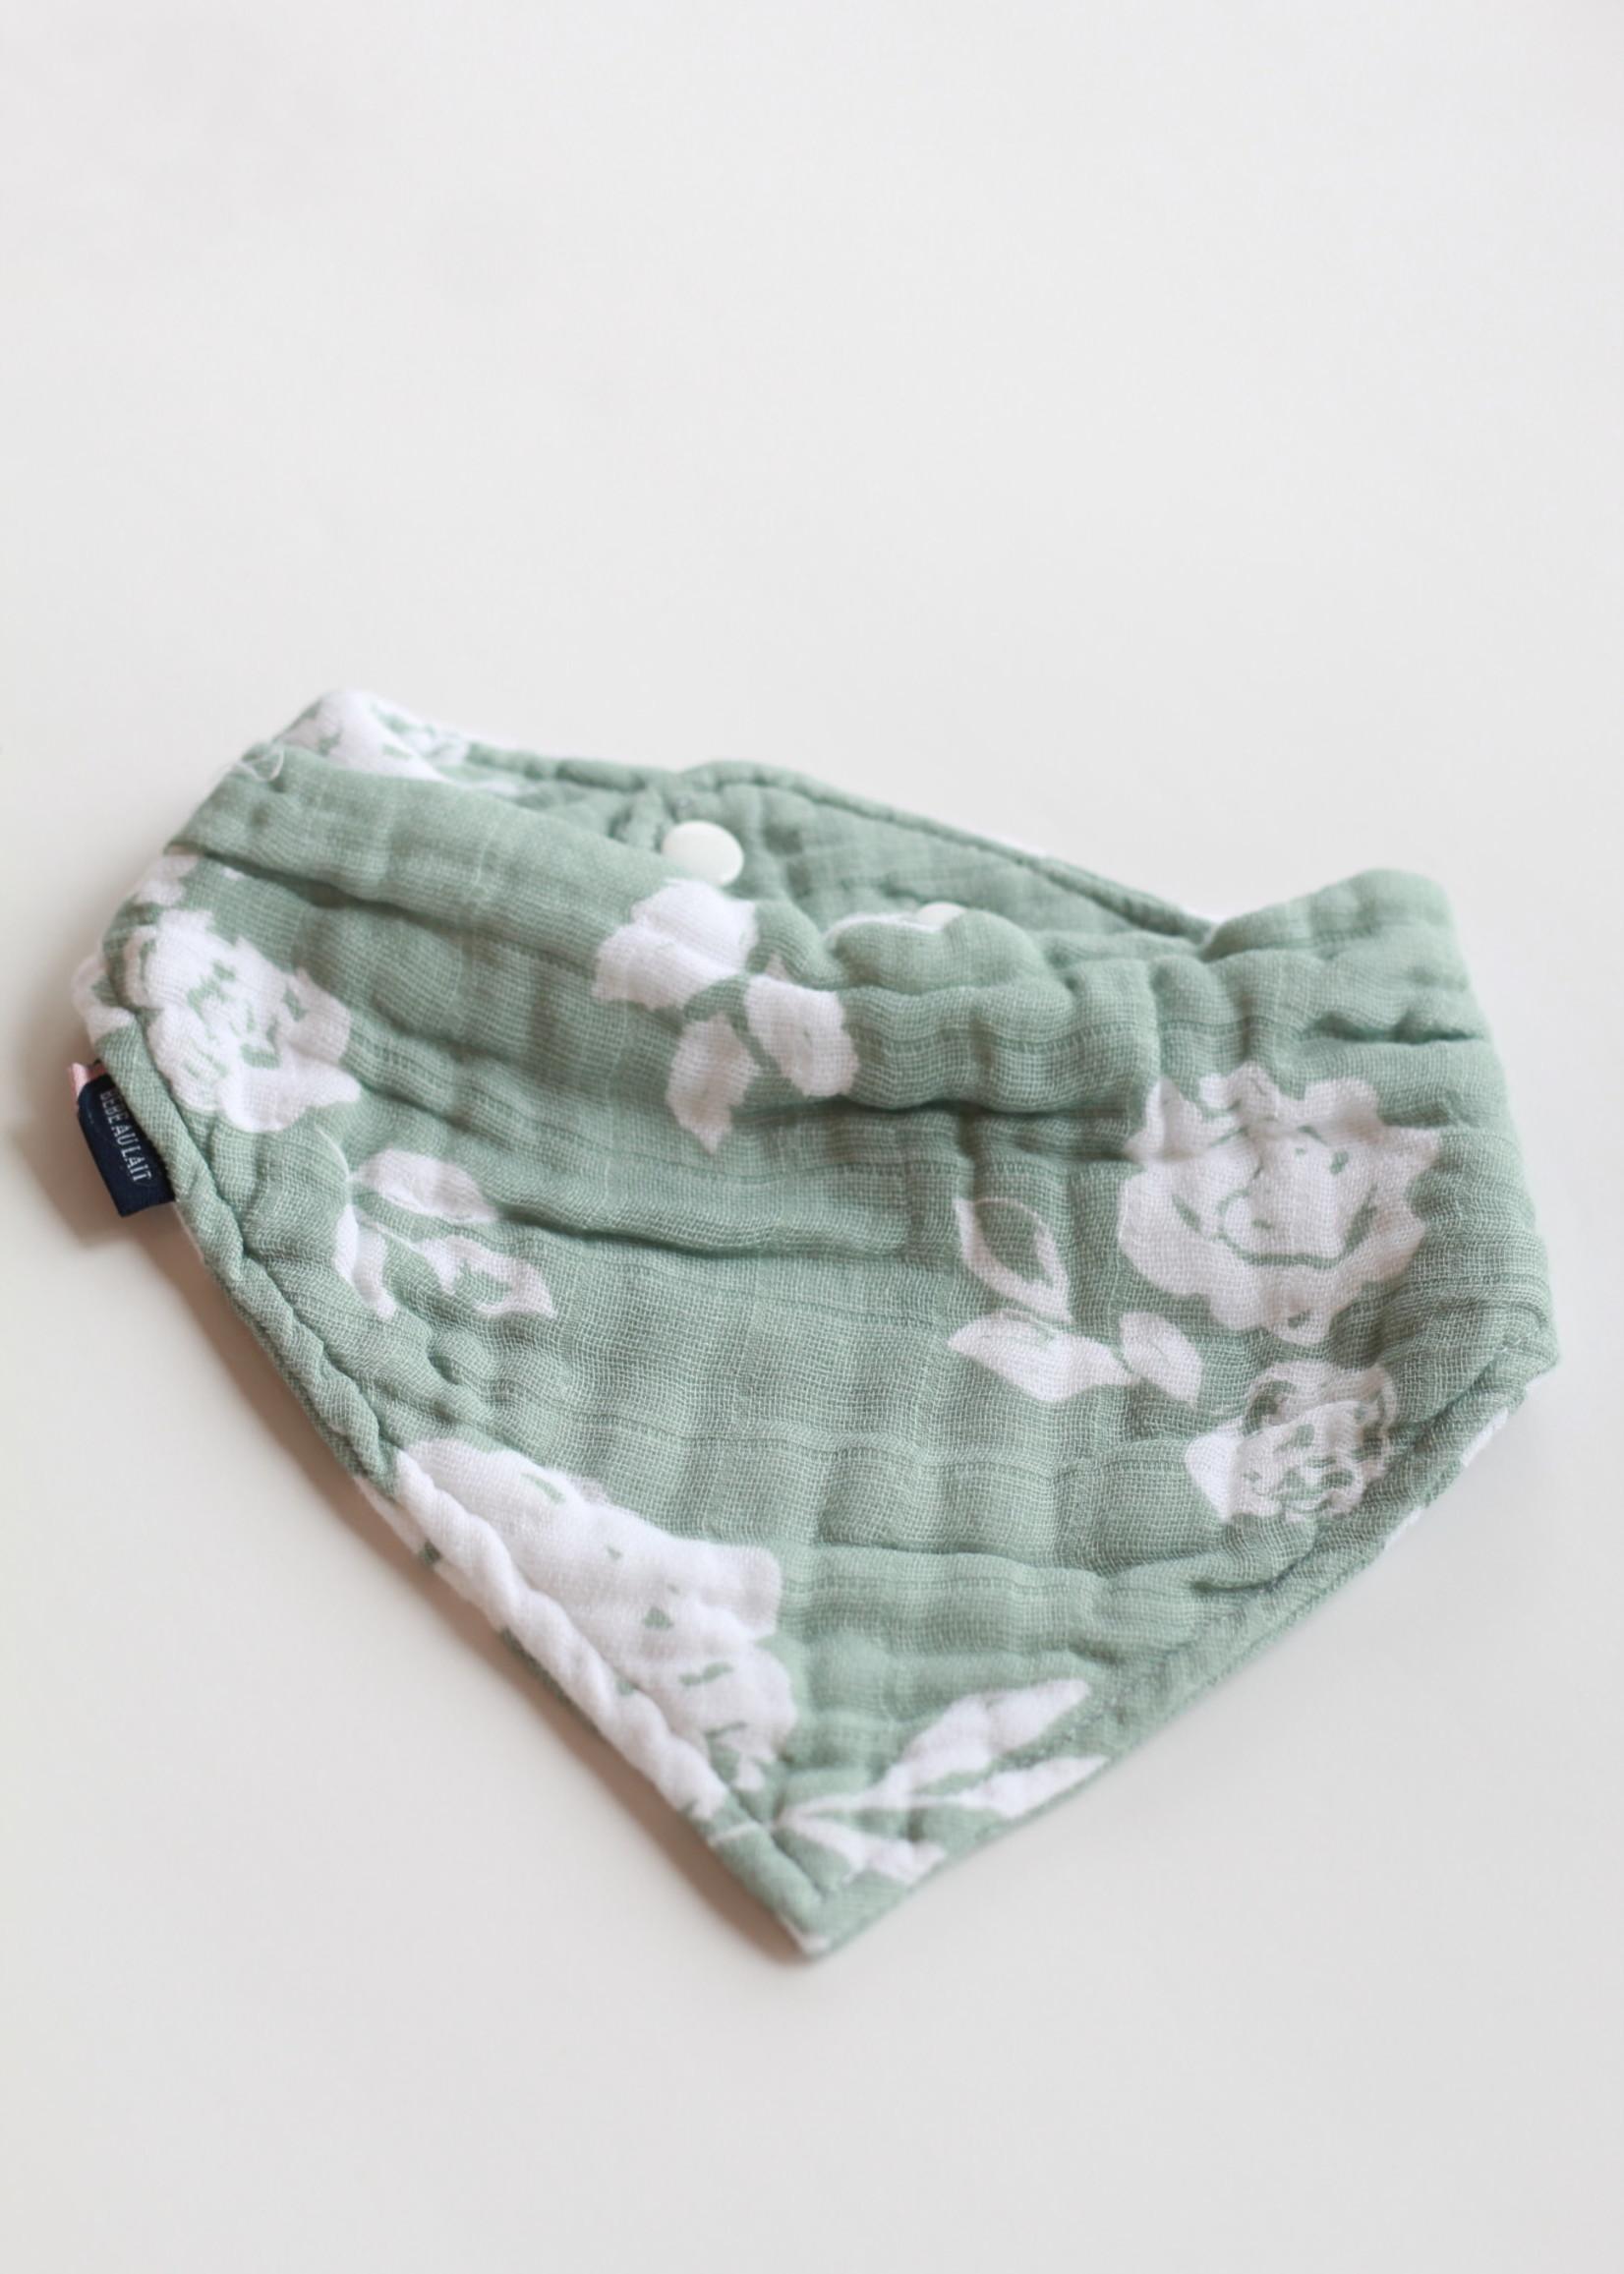 Bebe Au Lait Vintage Floral Cotton Muslin Bandana Bib